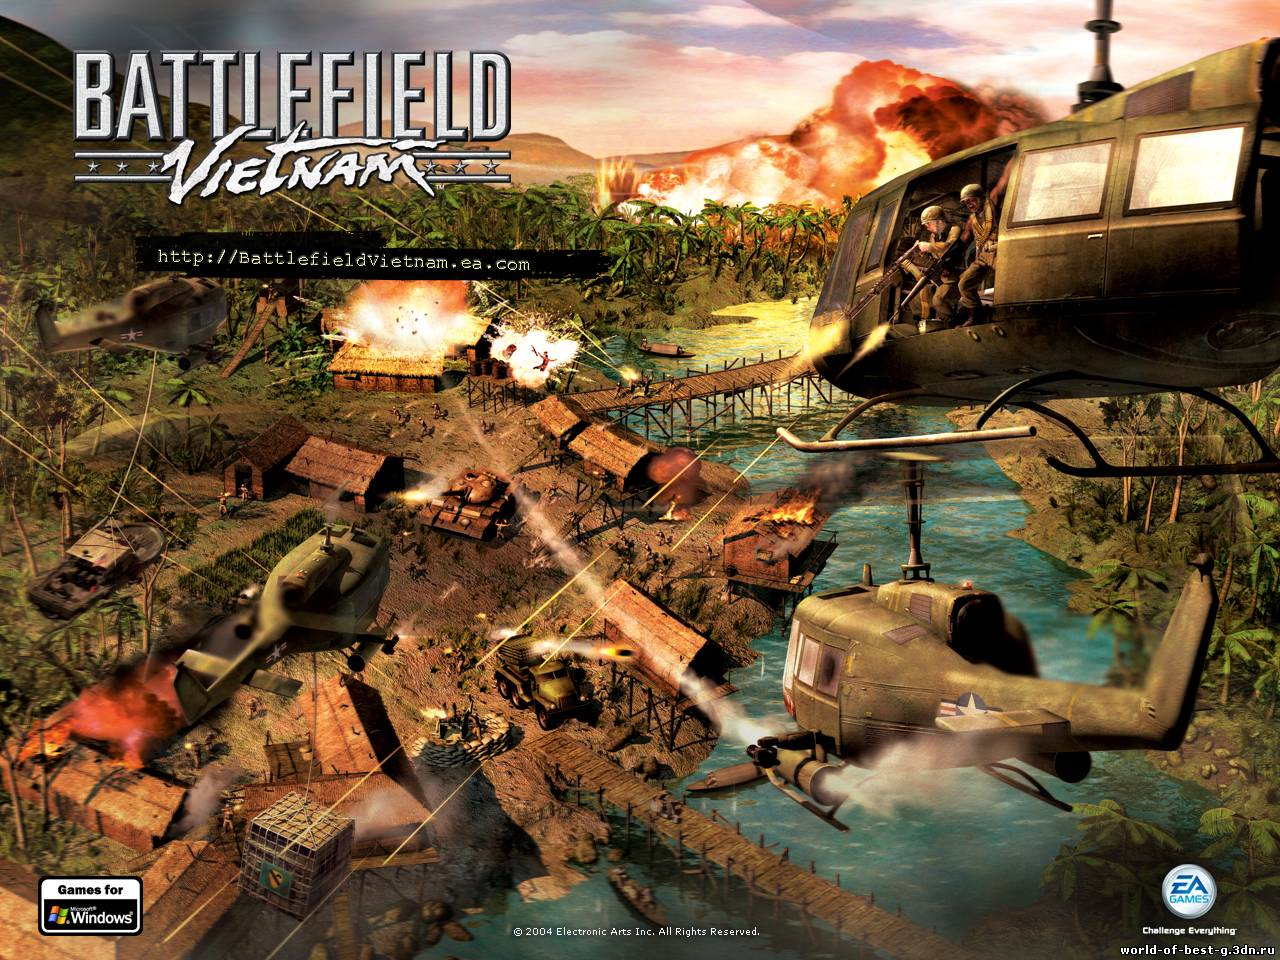 Battlefield bad company 2 vietnam ost 742510018